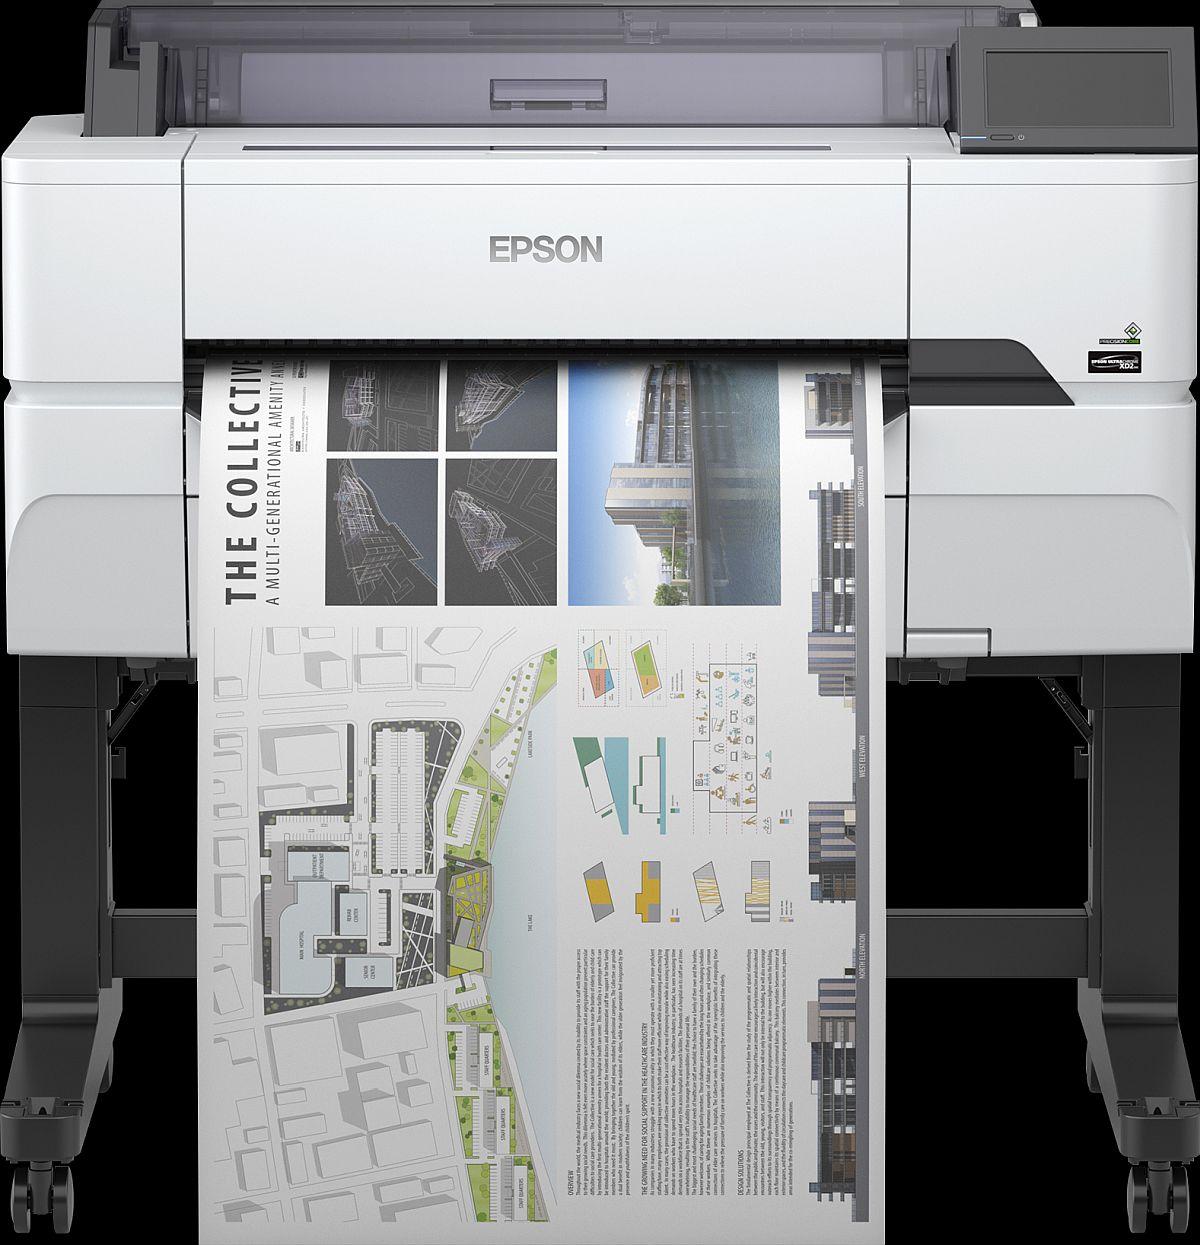 adelaparvu.com despre imprimante pentru arhitecti, designeri, ingineri, artisti, model Epson SC-T3400 (2)